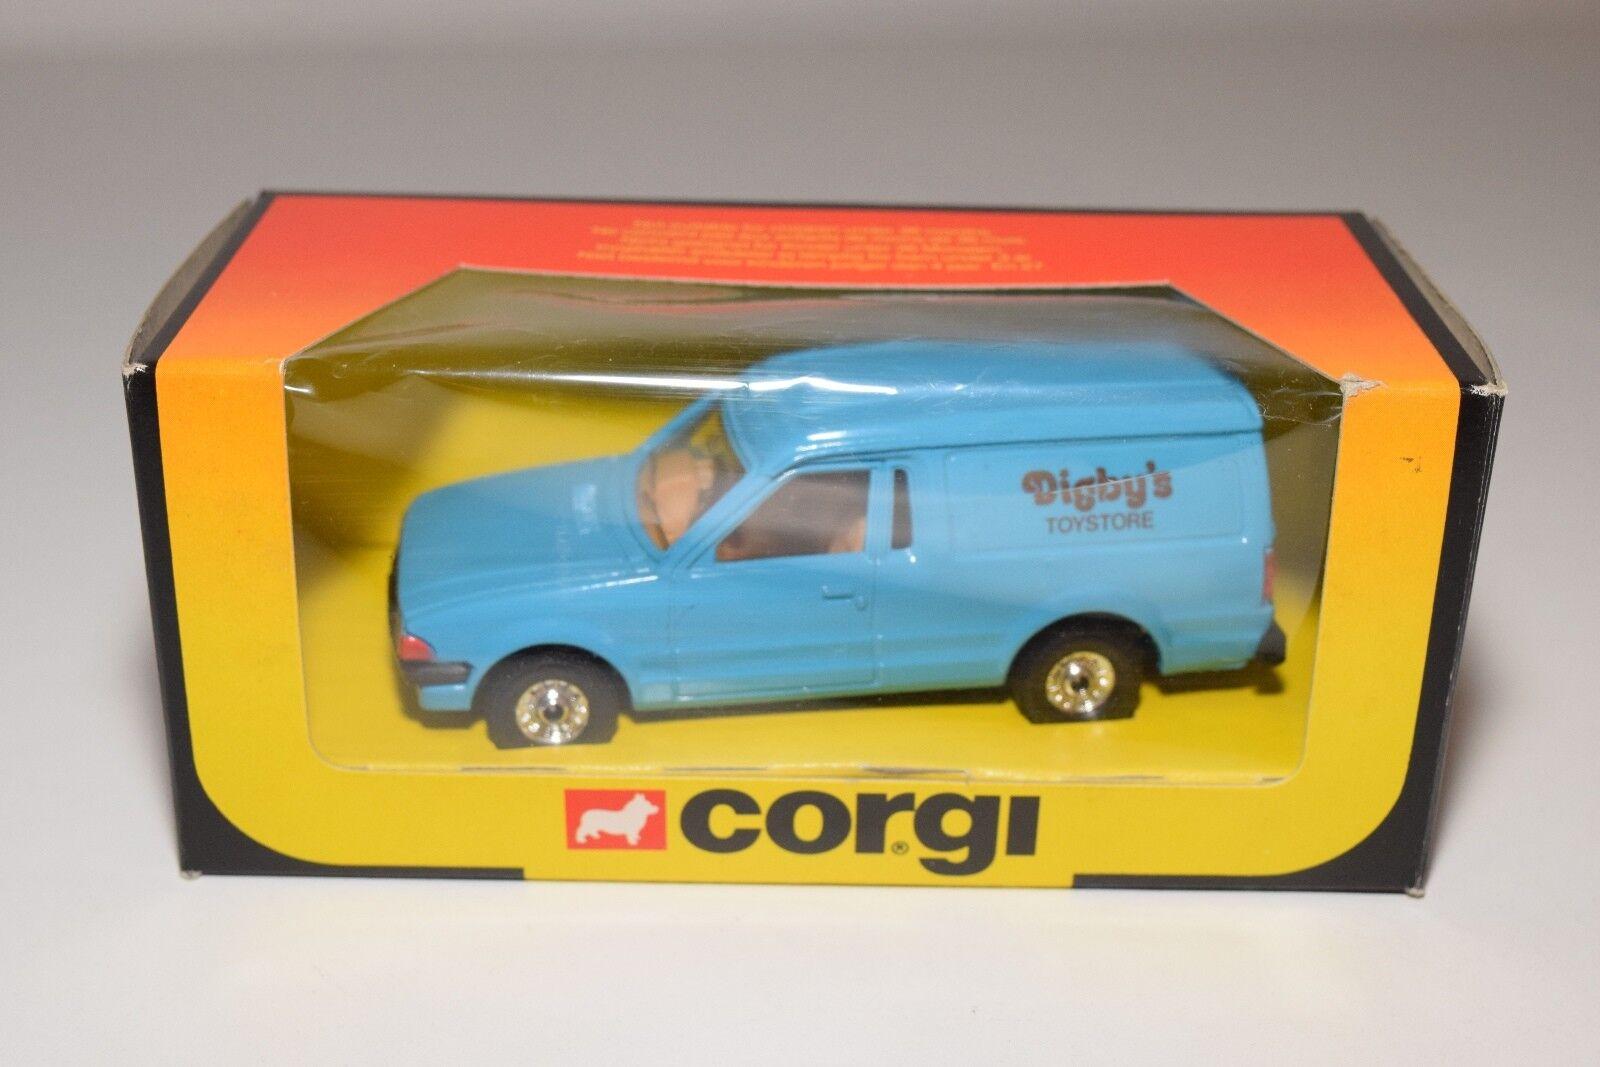 ^ corgi spielzeug 497 ford escort 55 van digby ist toystore mint umzingelt